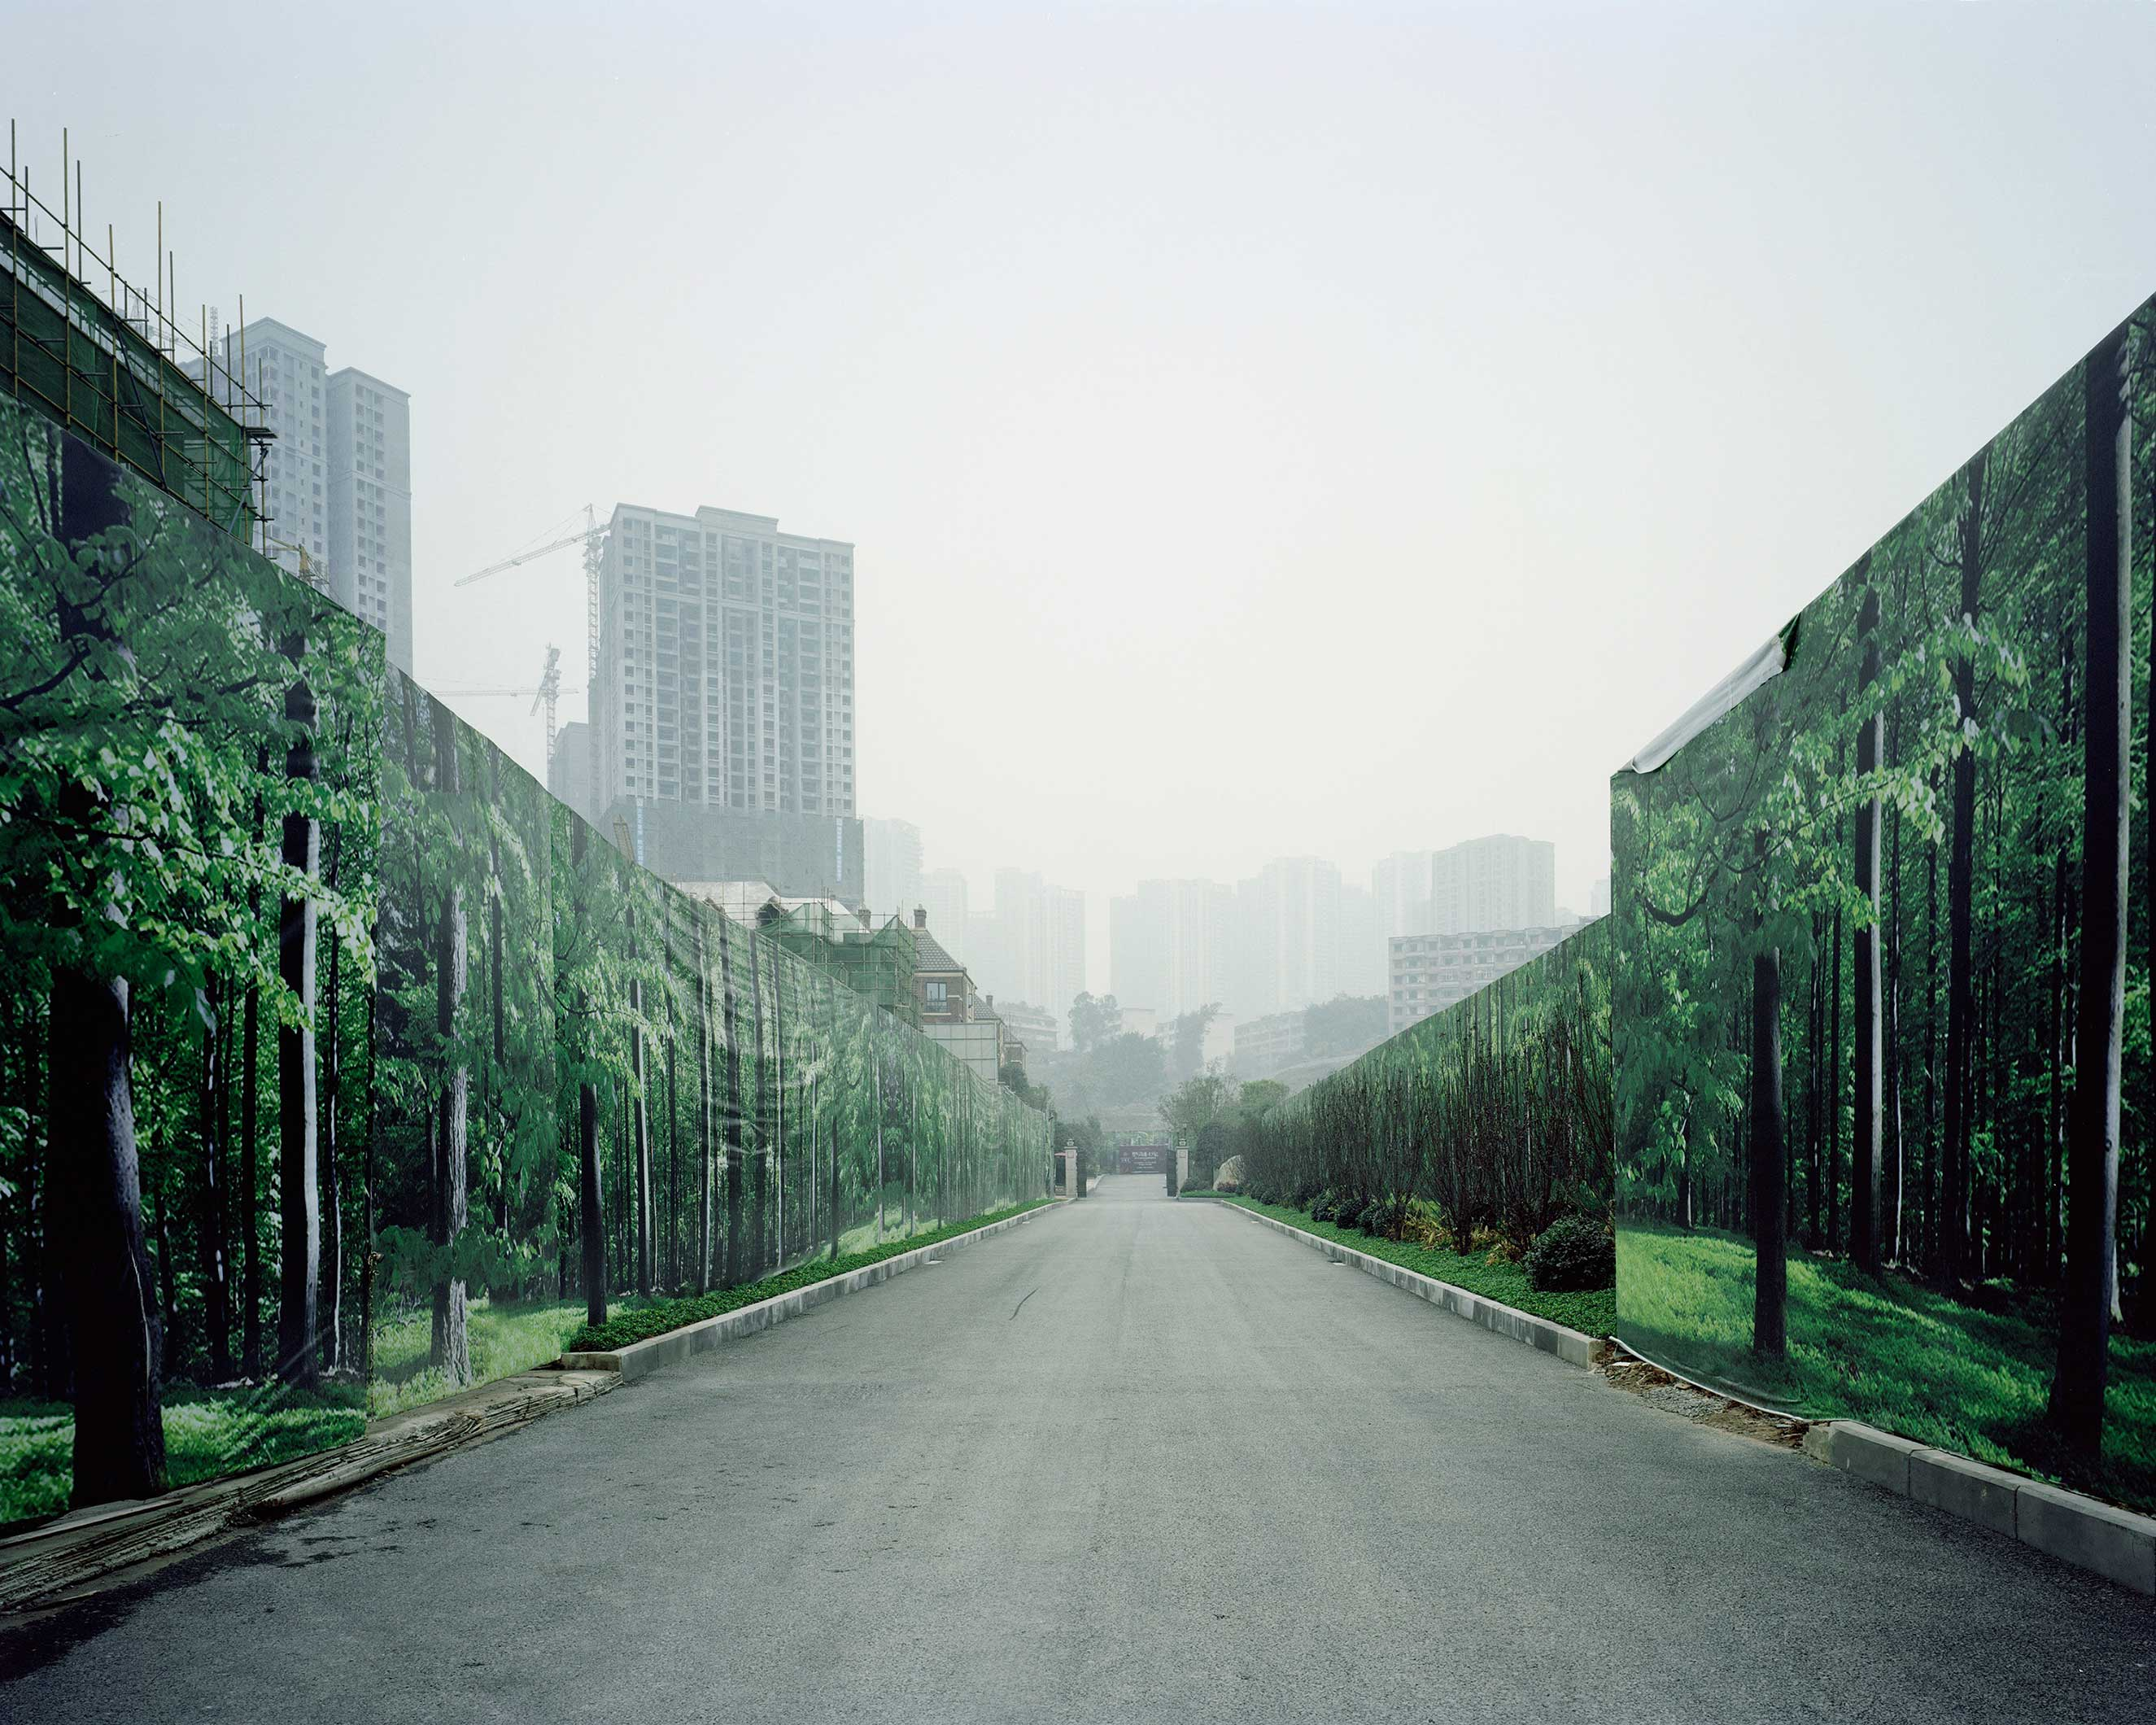 Chongqing, China, January 2015.